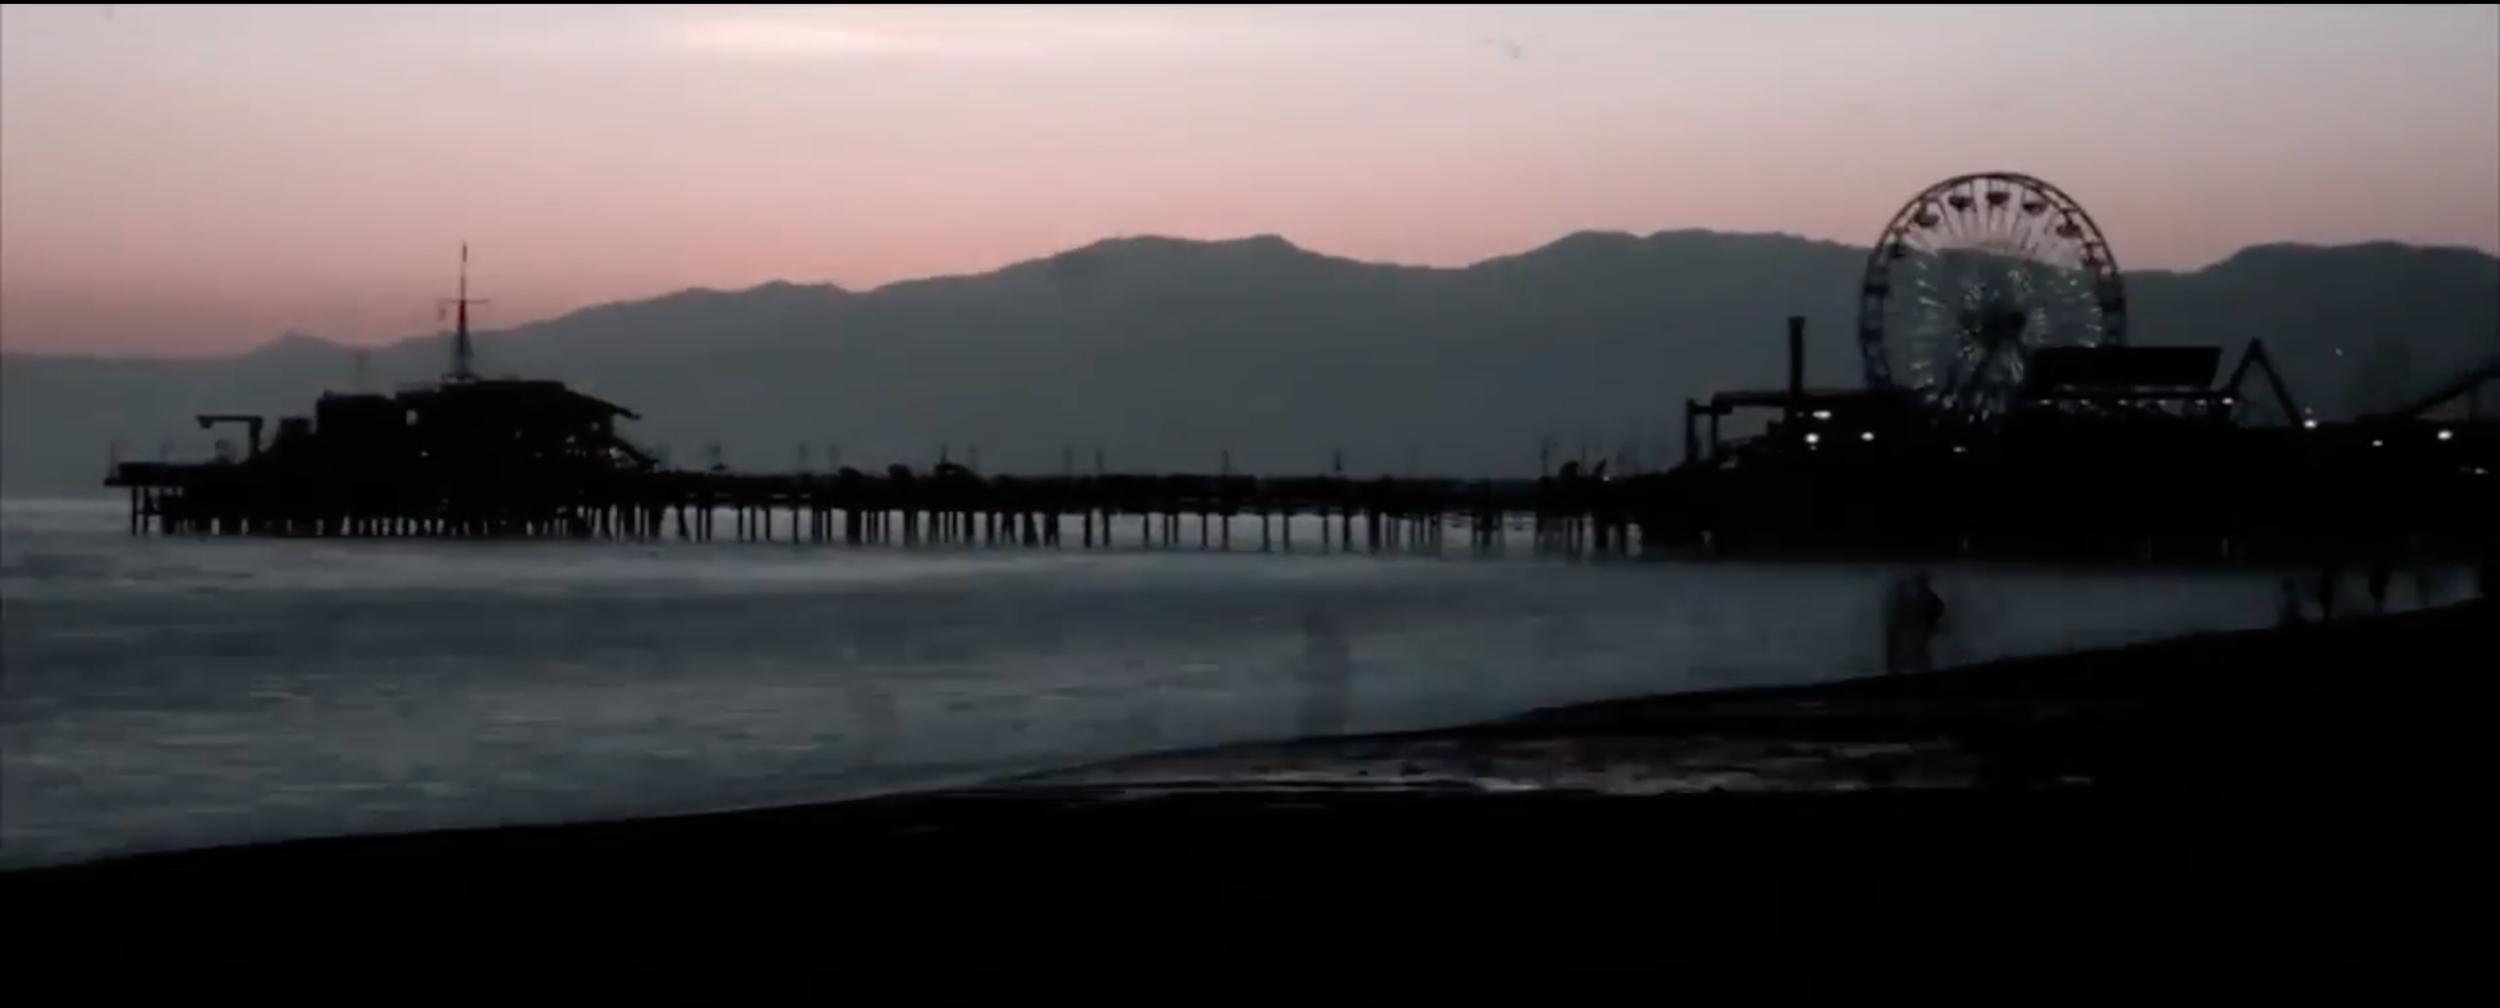 Established California_California Dreaming Santa Monica